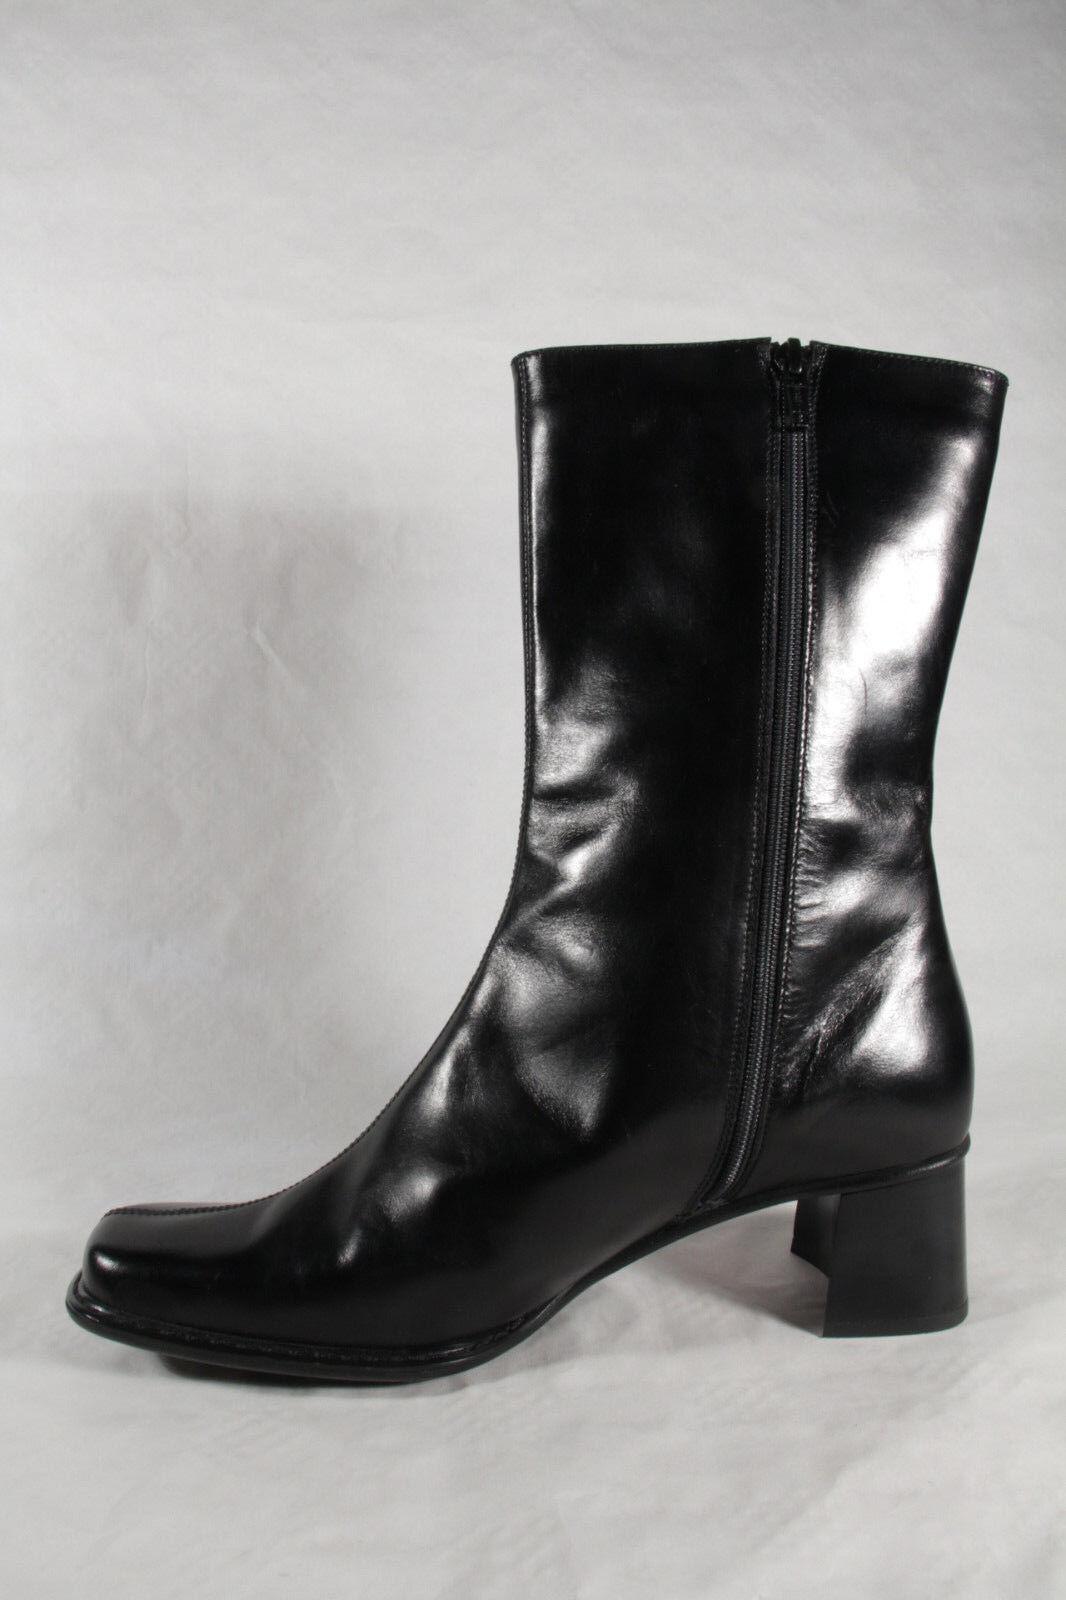 Lenci Damen Stiefel Stiefel Stiefel schwarz Echtleder Neu 07bcb2